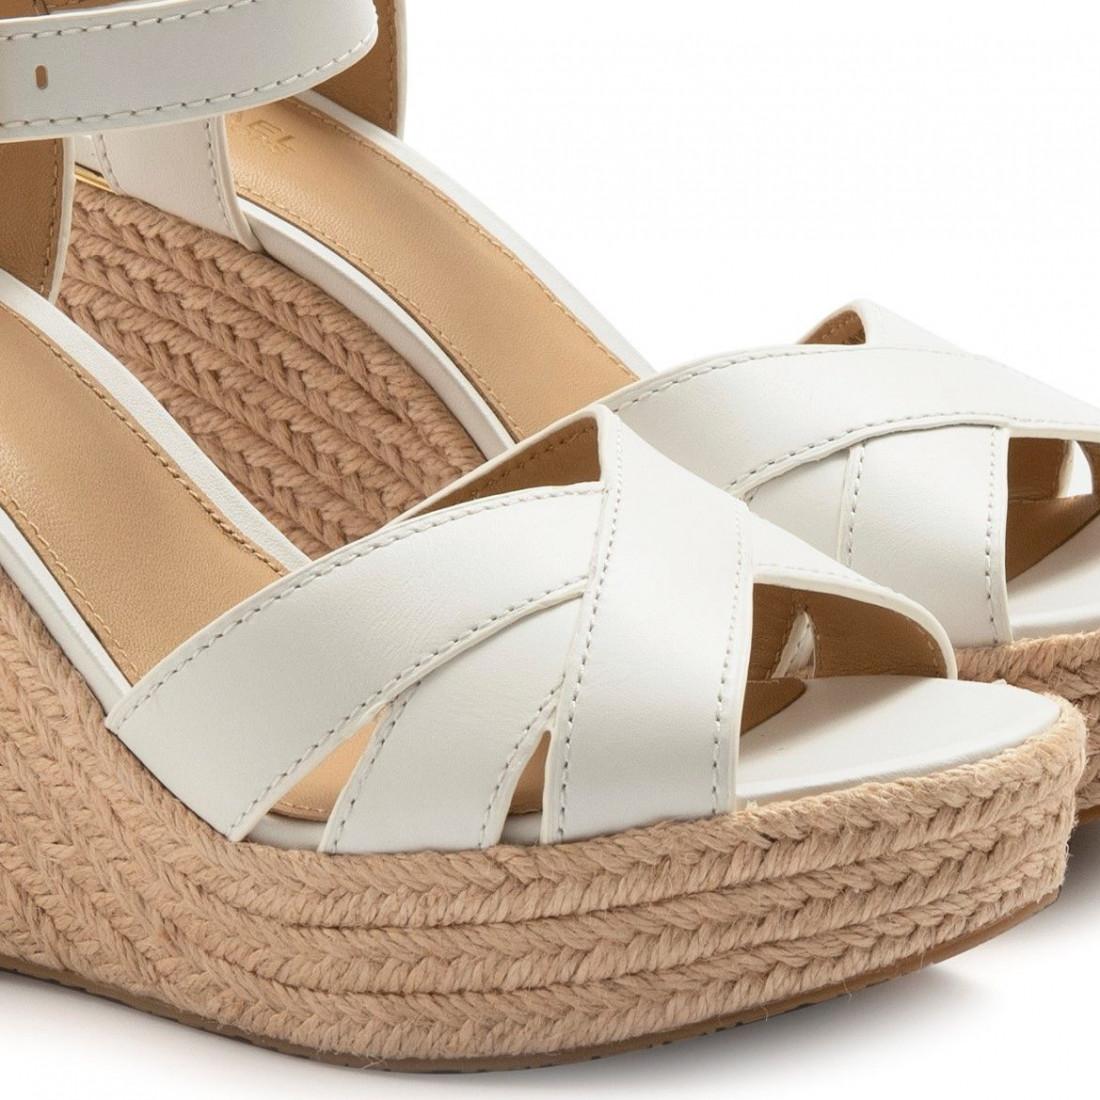 sandals woman michael kors 40s0uzms1l085 6808